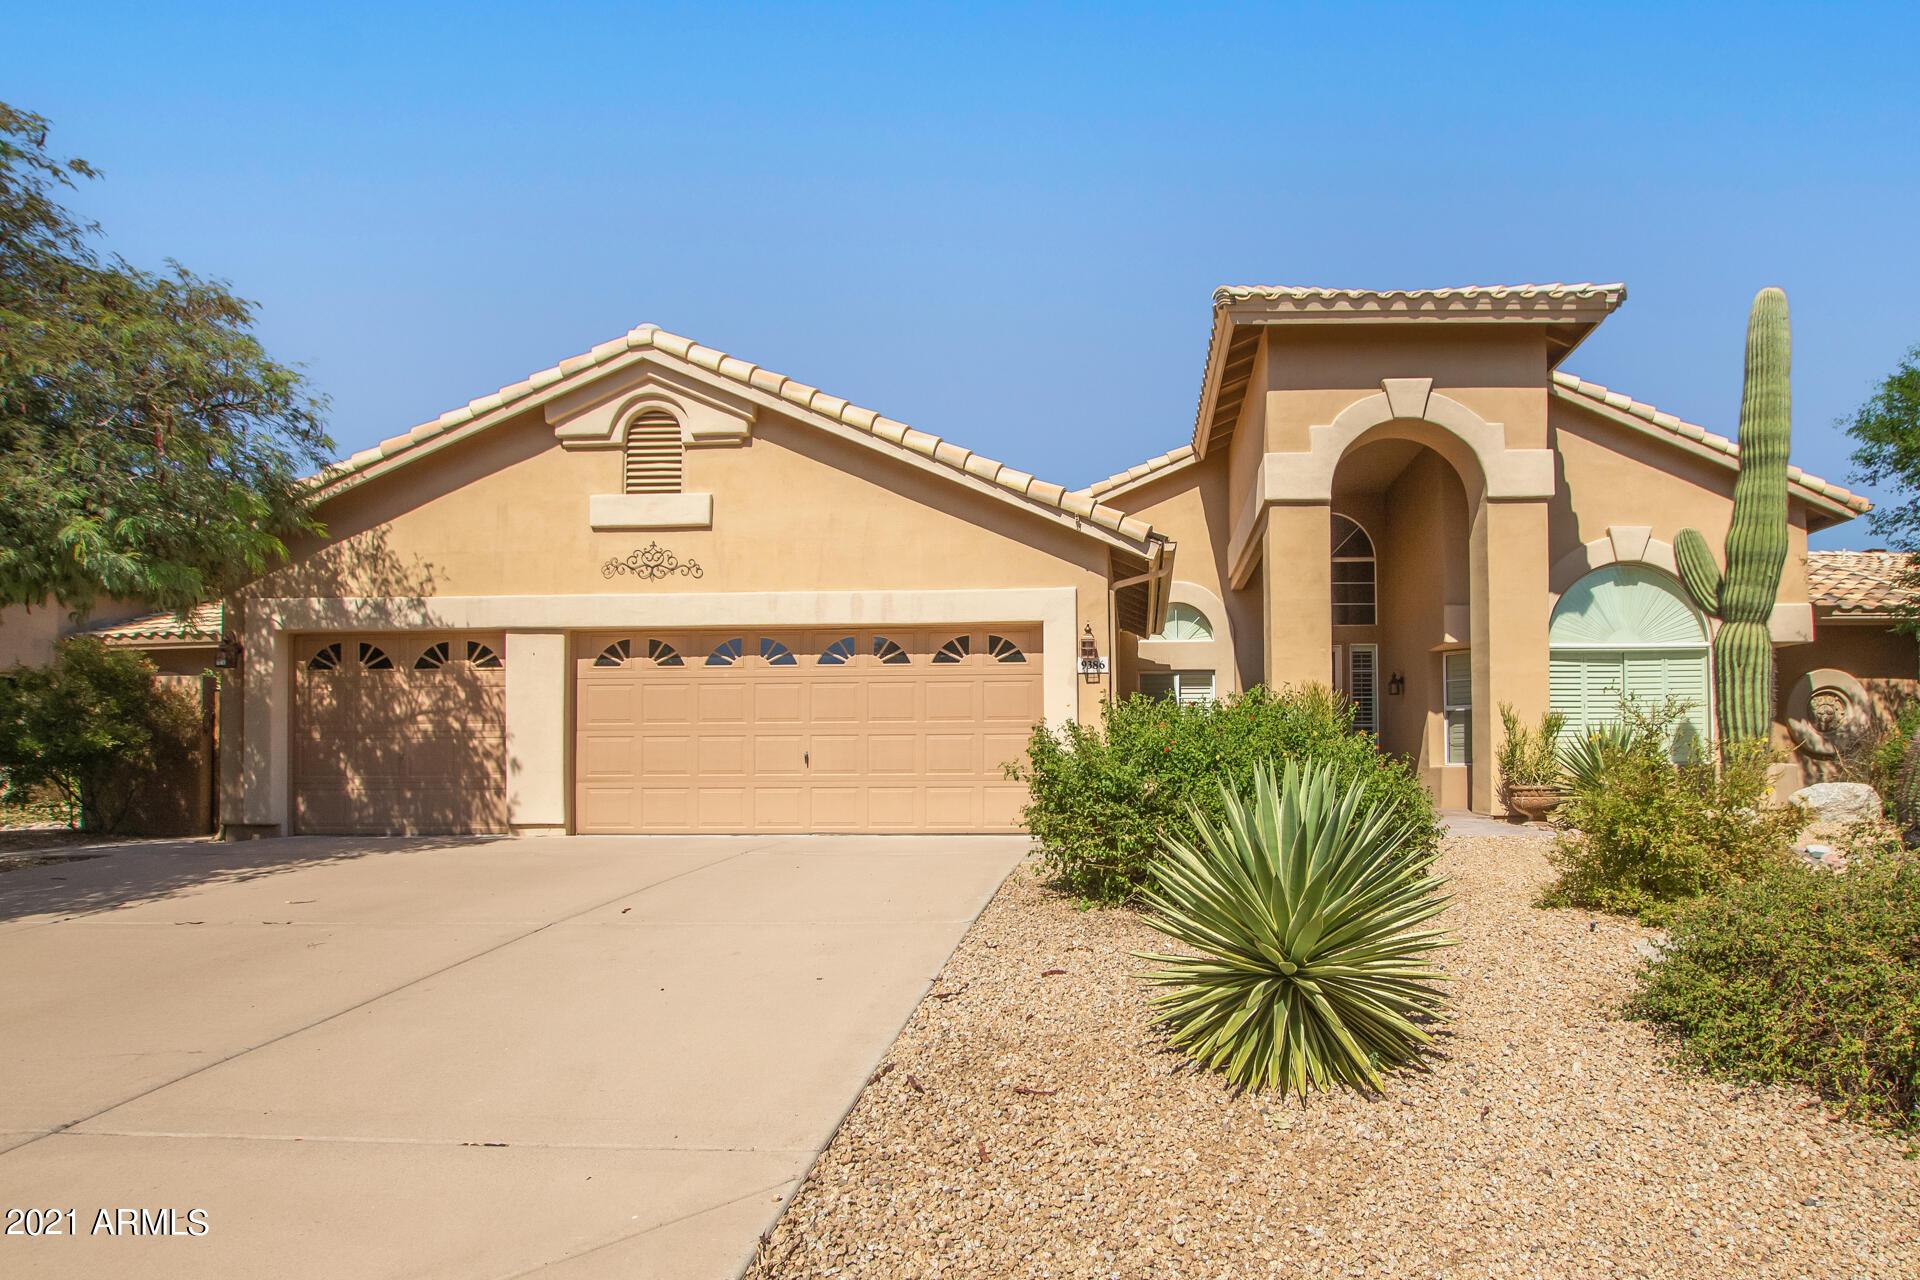 9386 E Southwind Lane, Scottsdale AZ 85262 - Photo 1